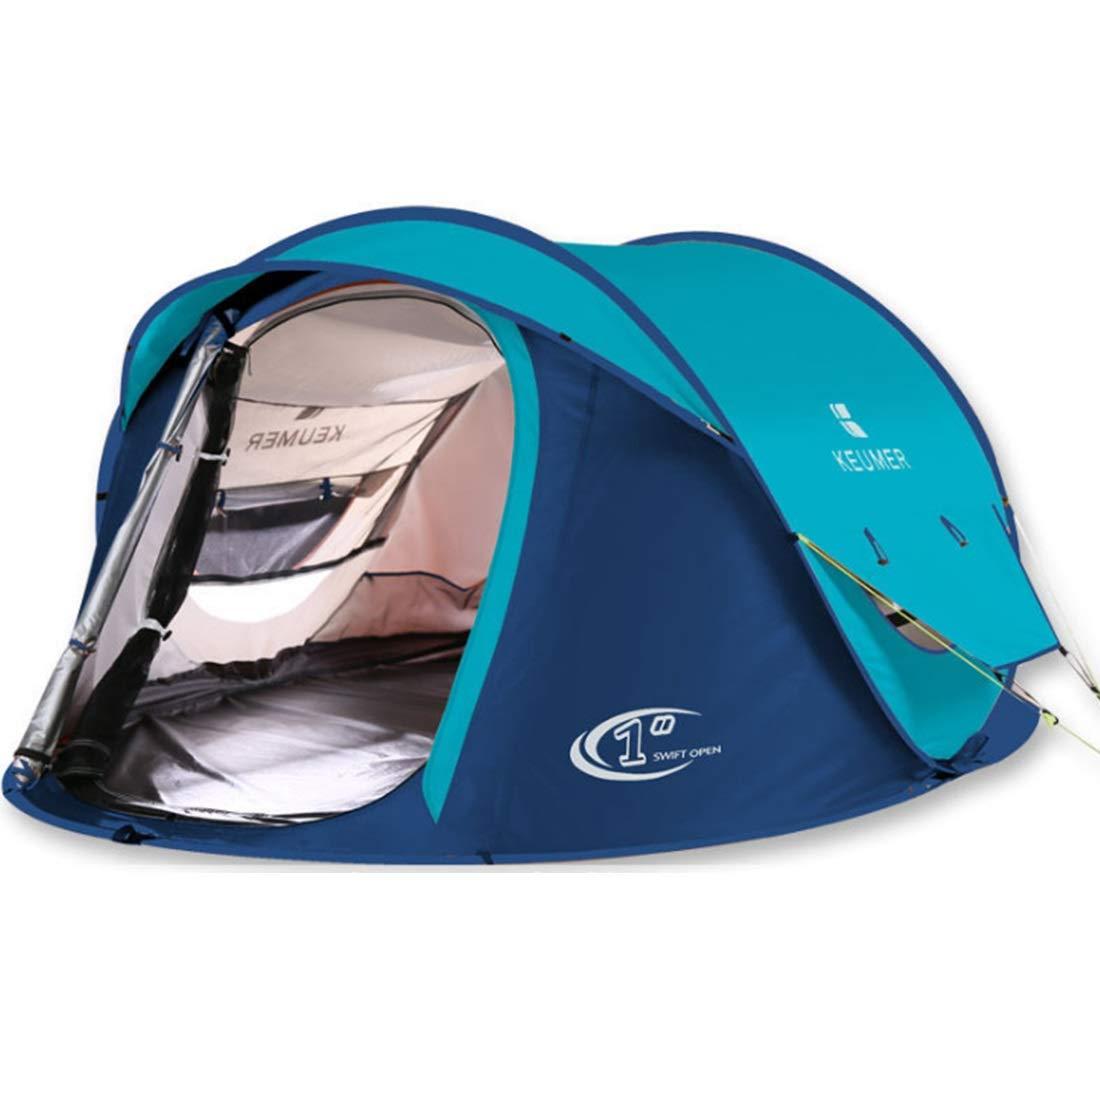 Fepelasi Winddichtes Zelt 3 Personen oder 4 Personen (Farbe : Blau)